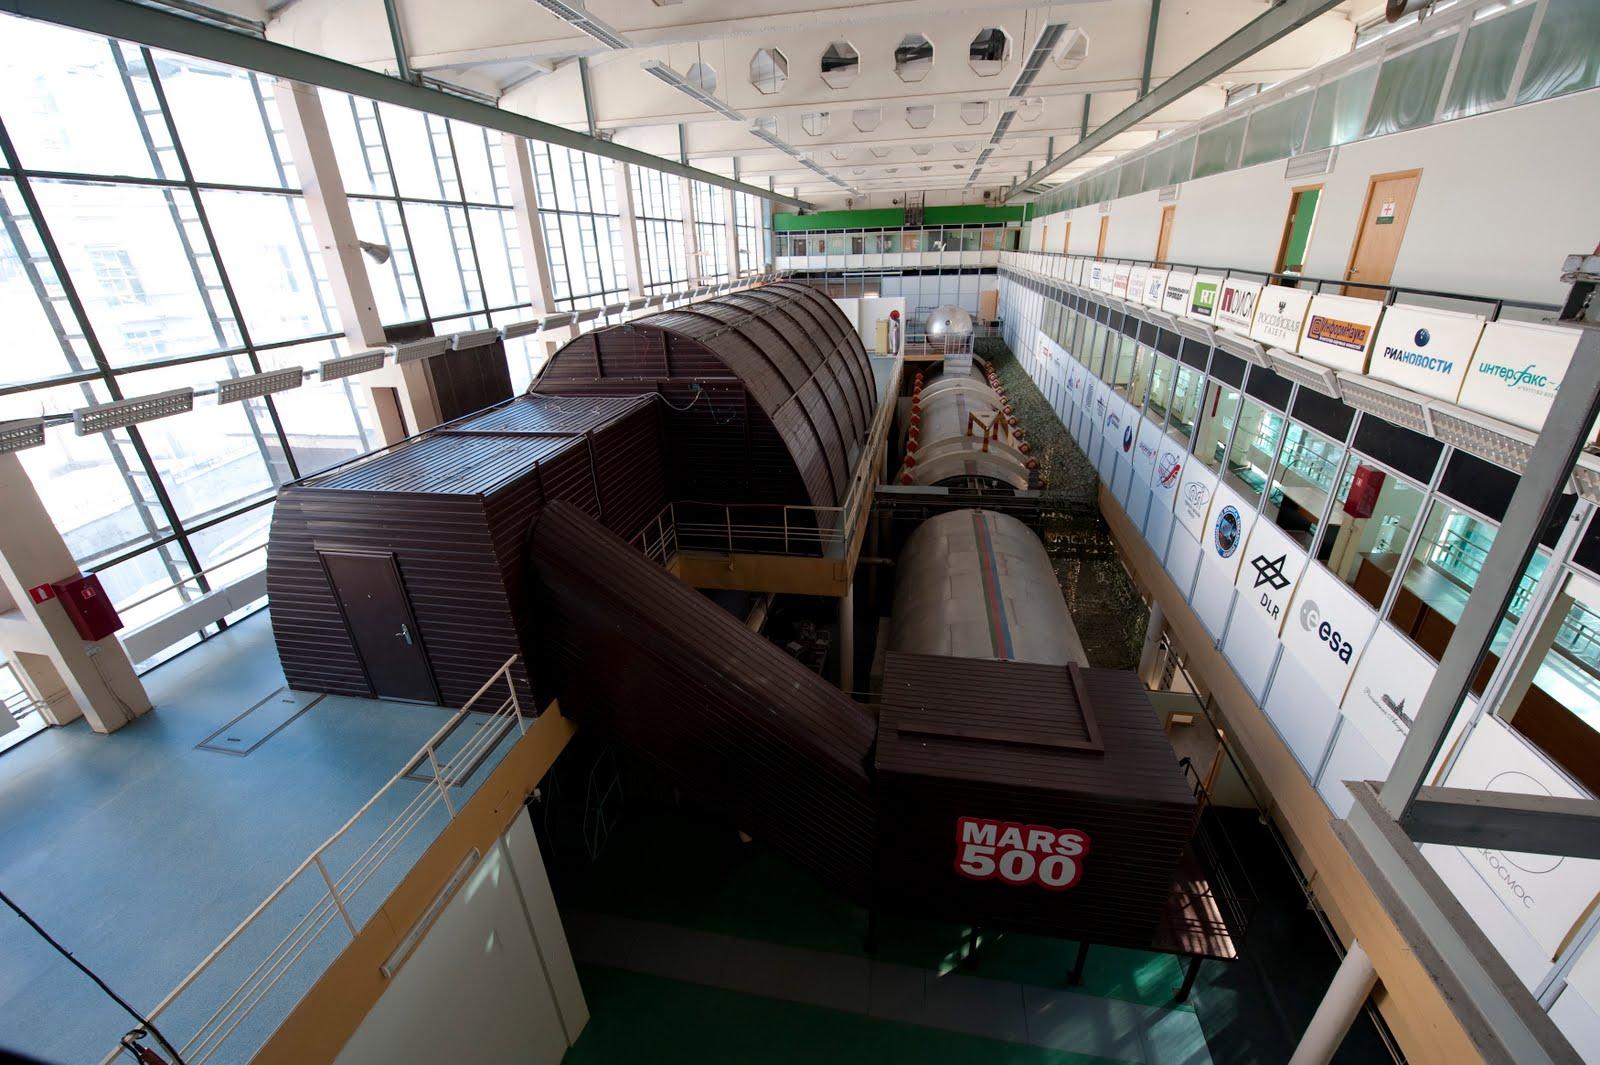 Mars Simulation Chamber The Simulation Chamber at The